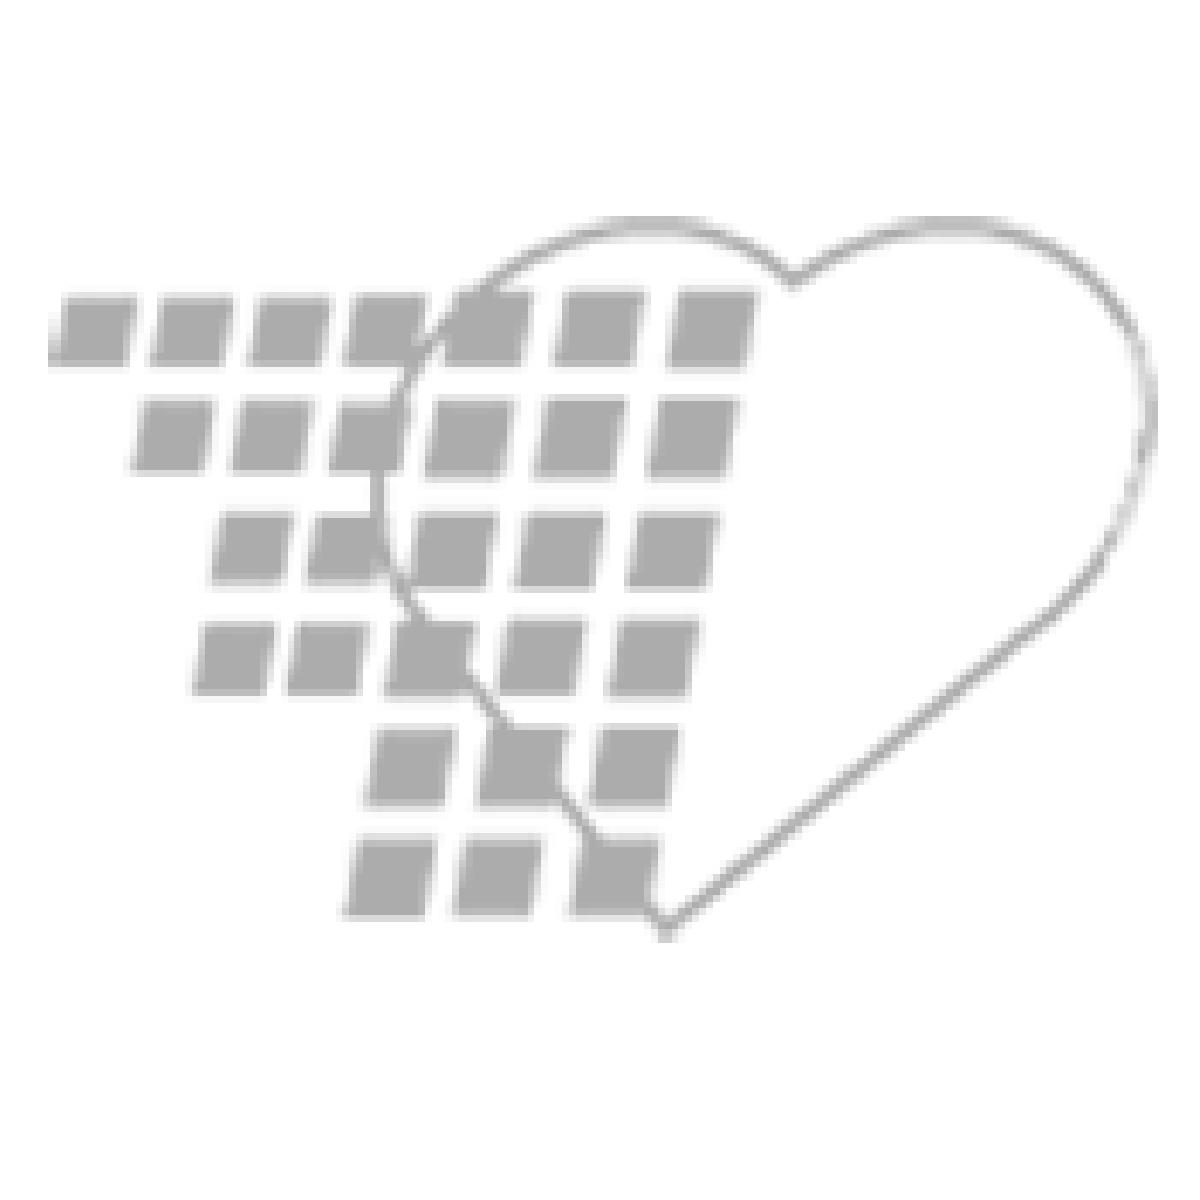 03-85-8060 Innovative Healthcare Corporation DermAssist® Dry Wipes